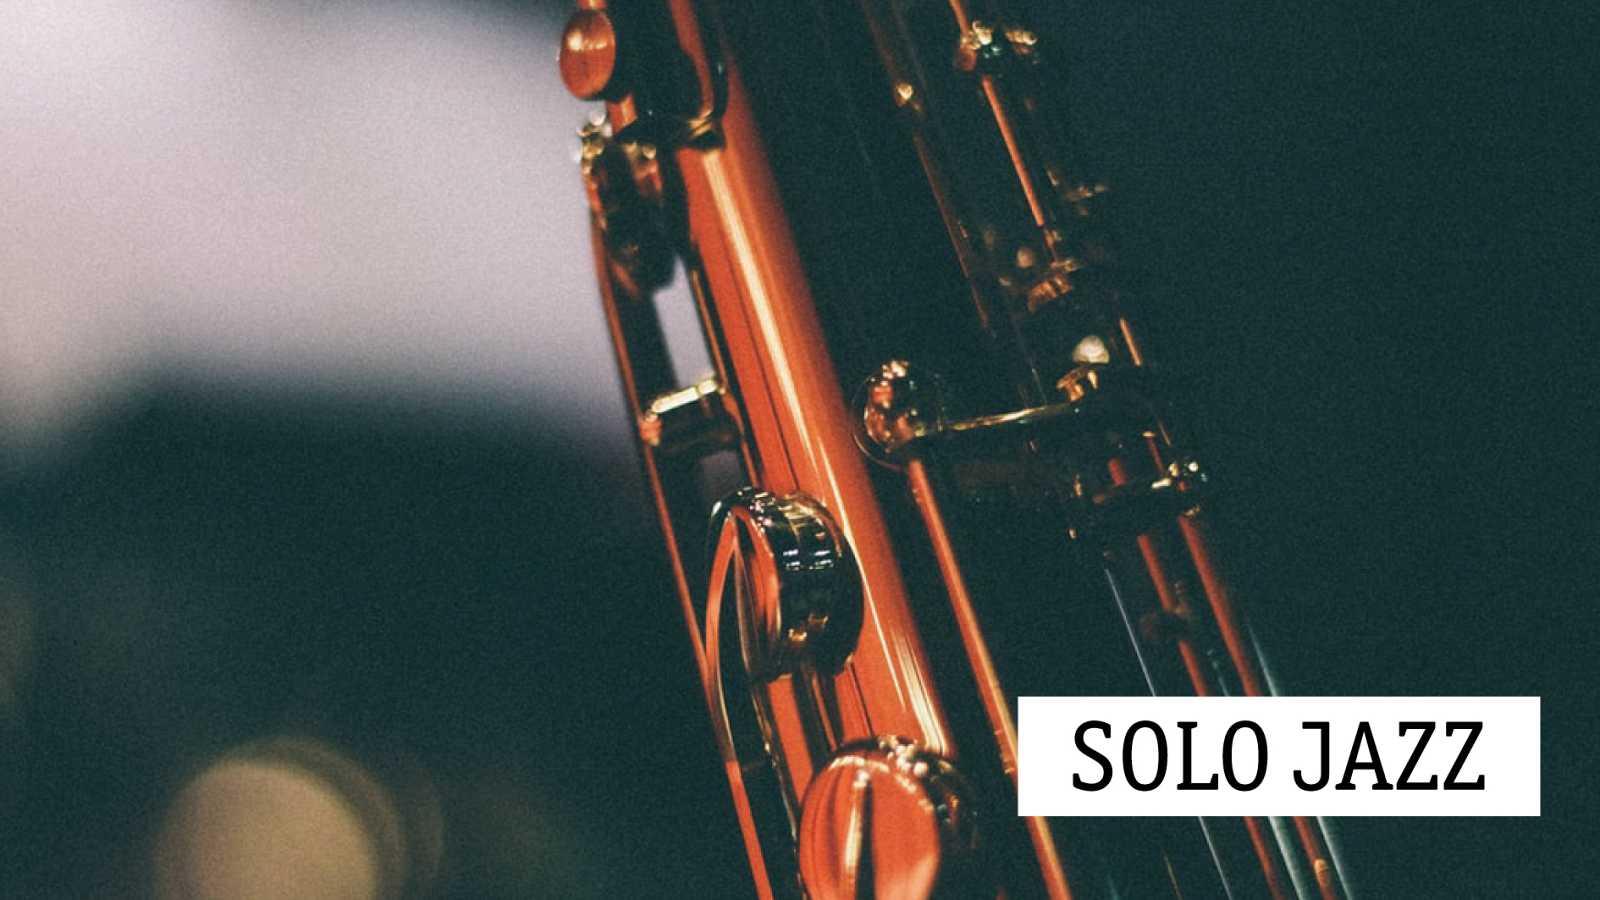 Solo Jazz - Chico O'Farrill, el imperativo afrocubano - 20/11/20 - escuchar ahora